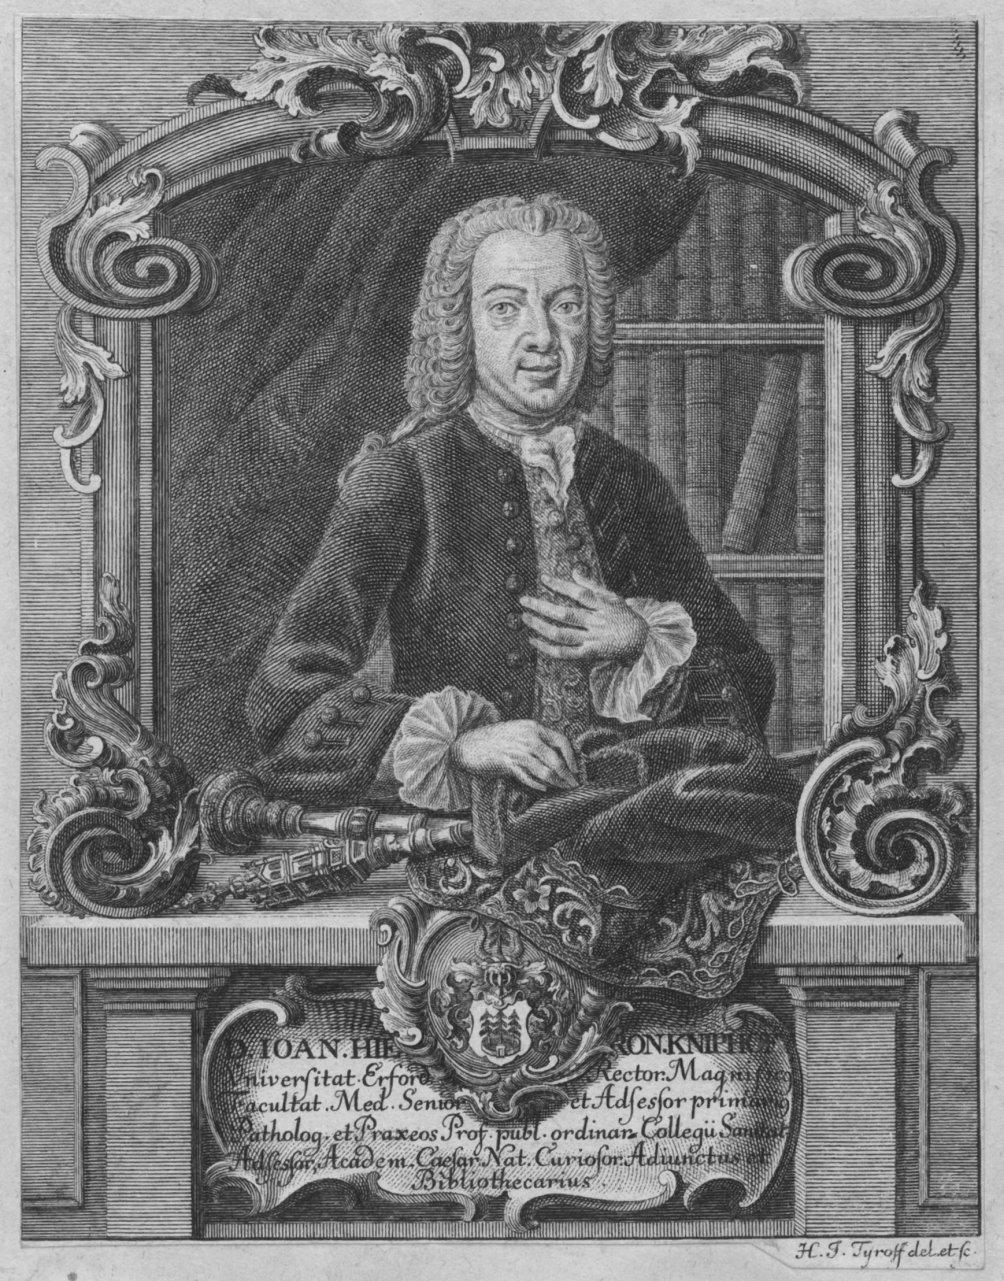 KNIPHOF, Johann Hieronymus (1704 - 1763). Halbfigur